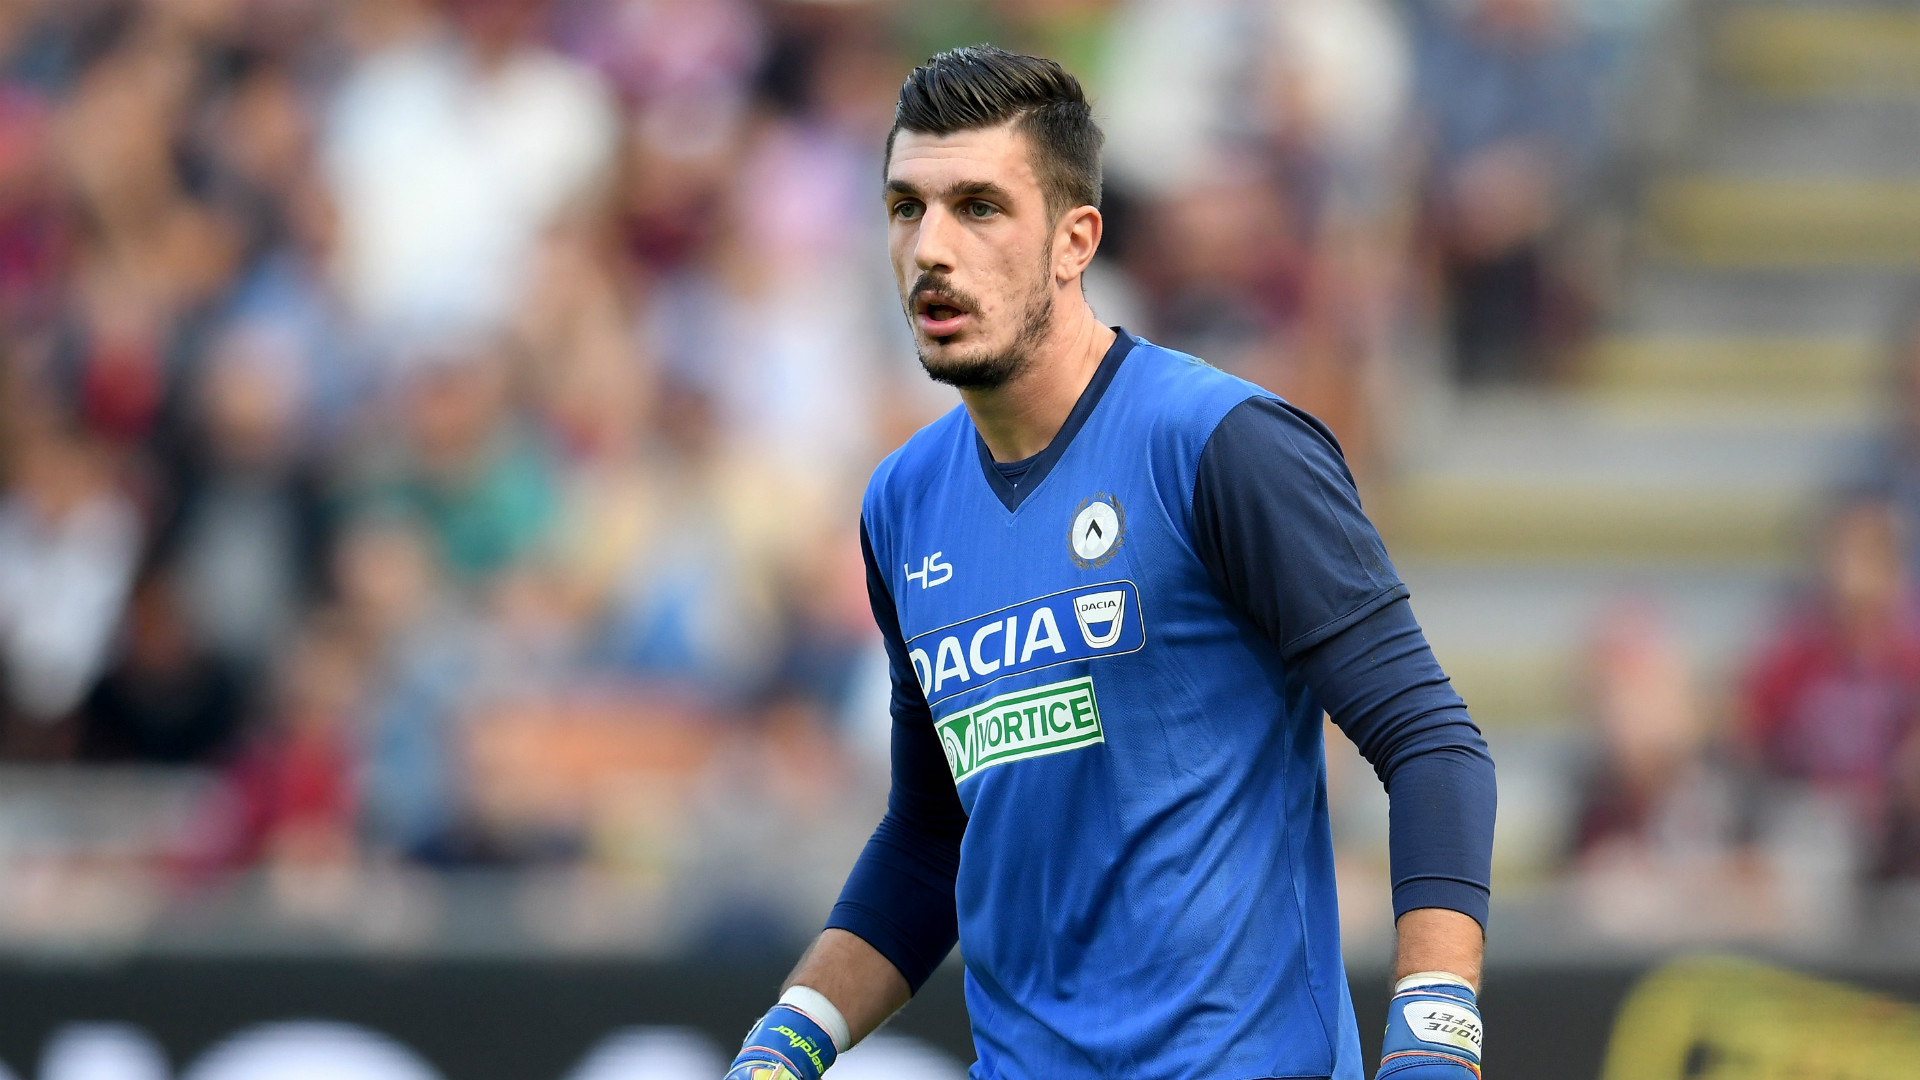 ایتالیا-سری آ-اودینزه-Udinese-Serie A